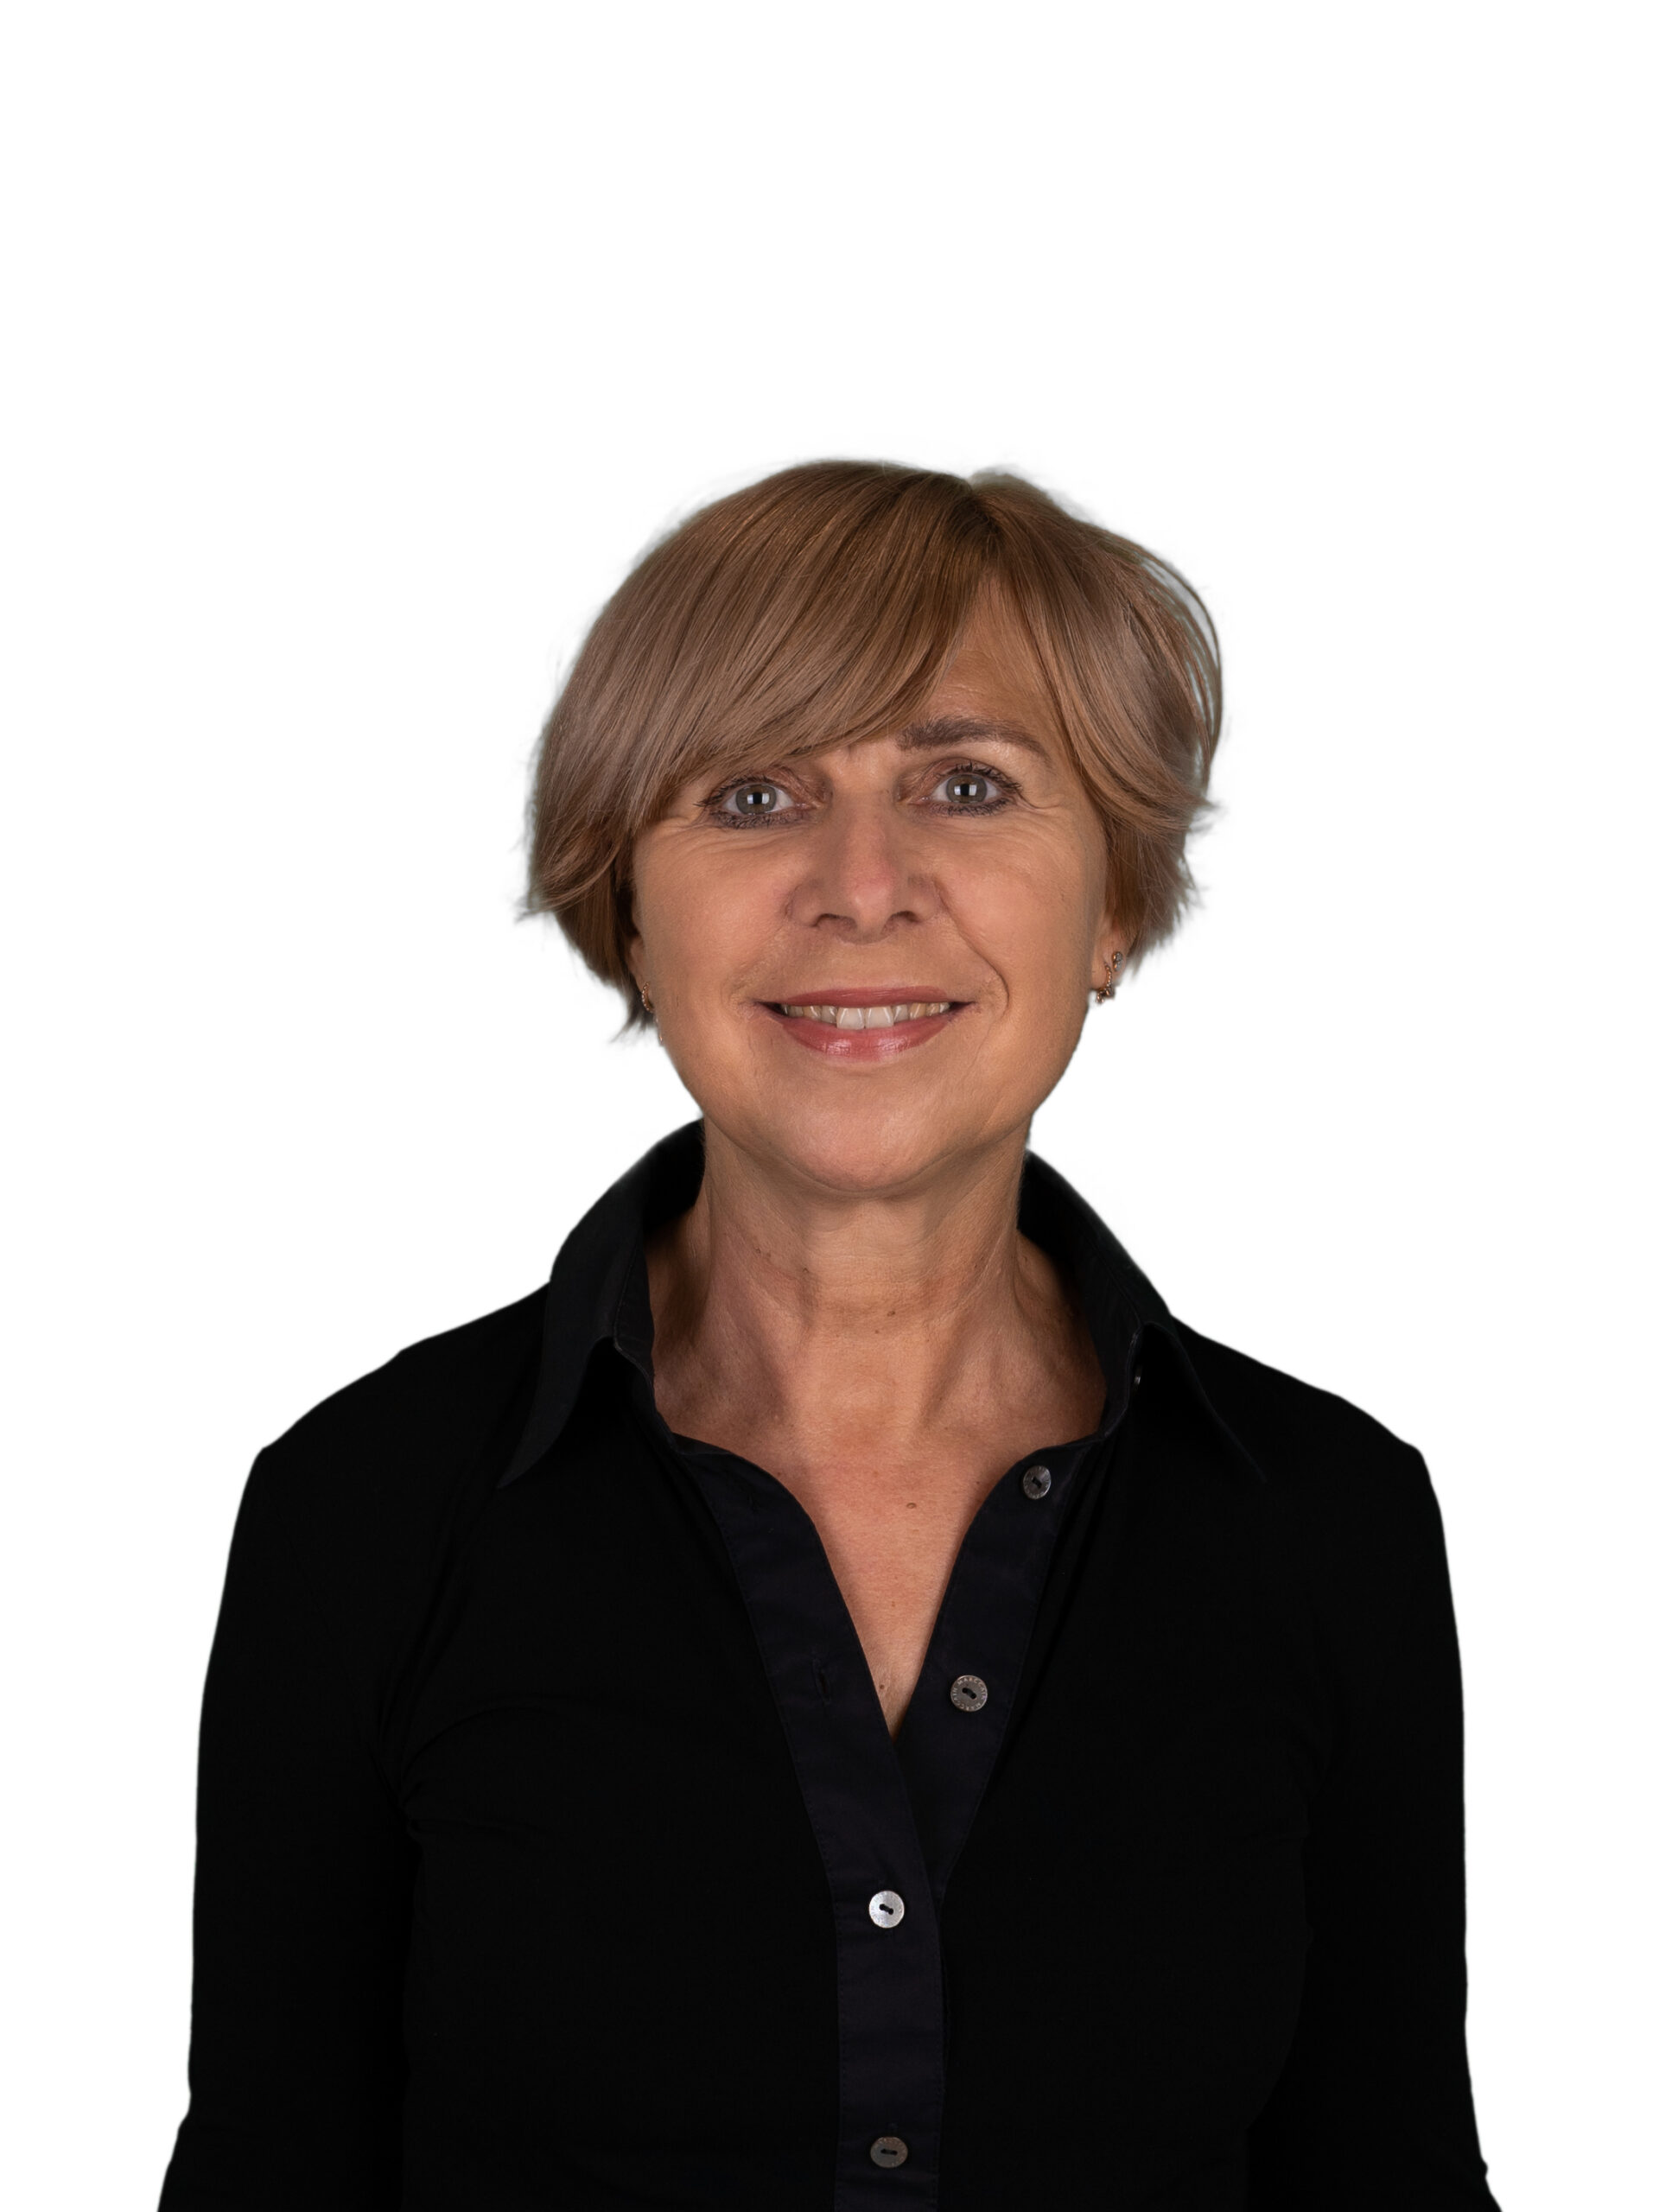 Angela Zeh